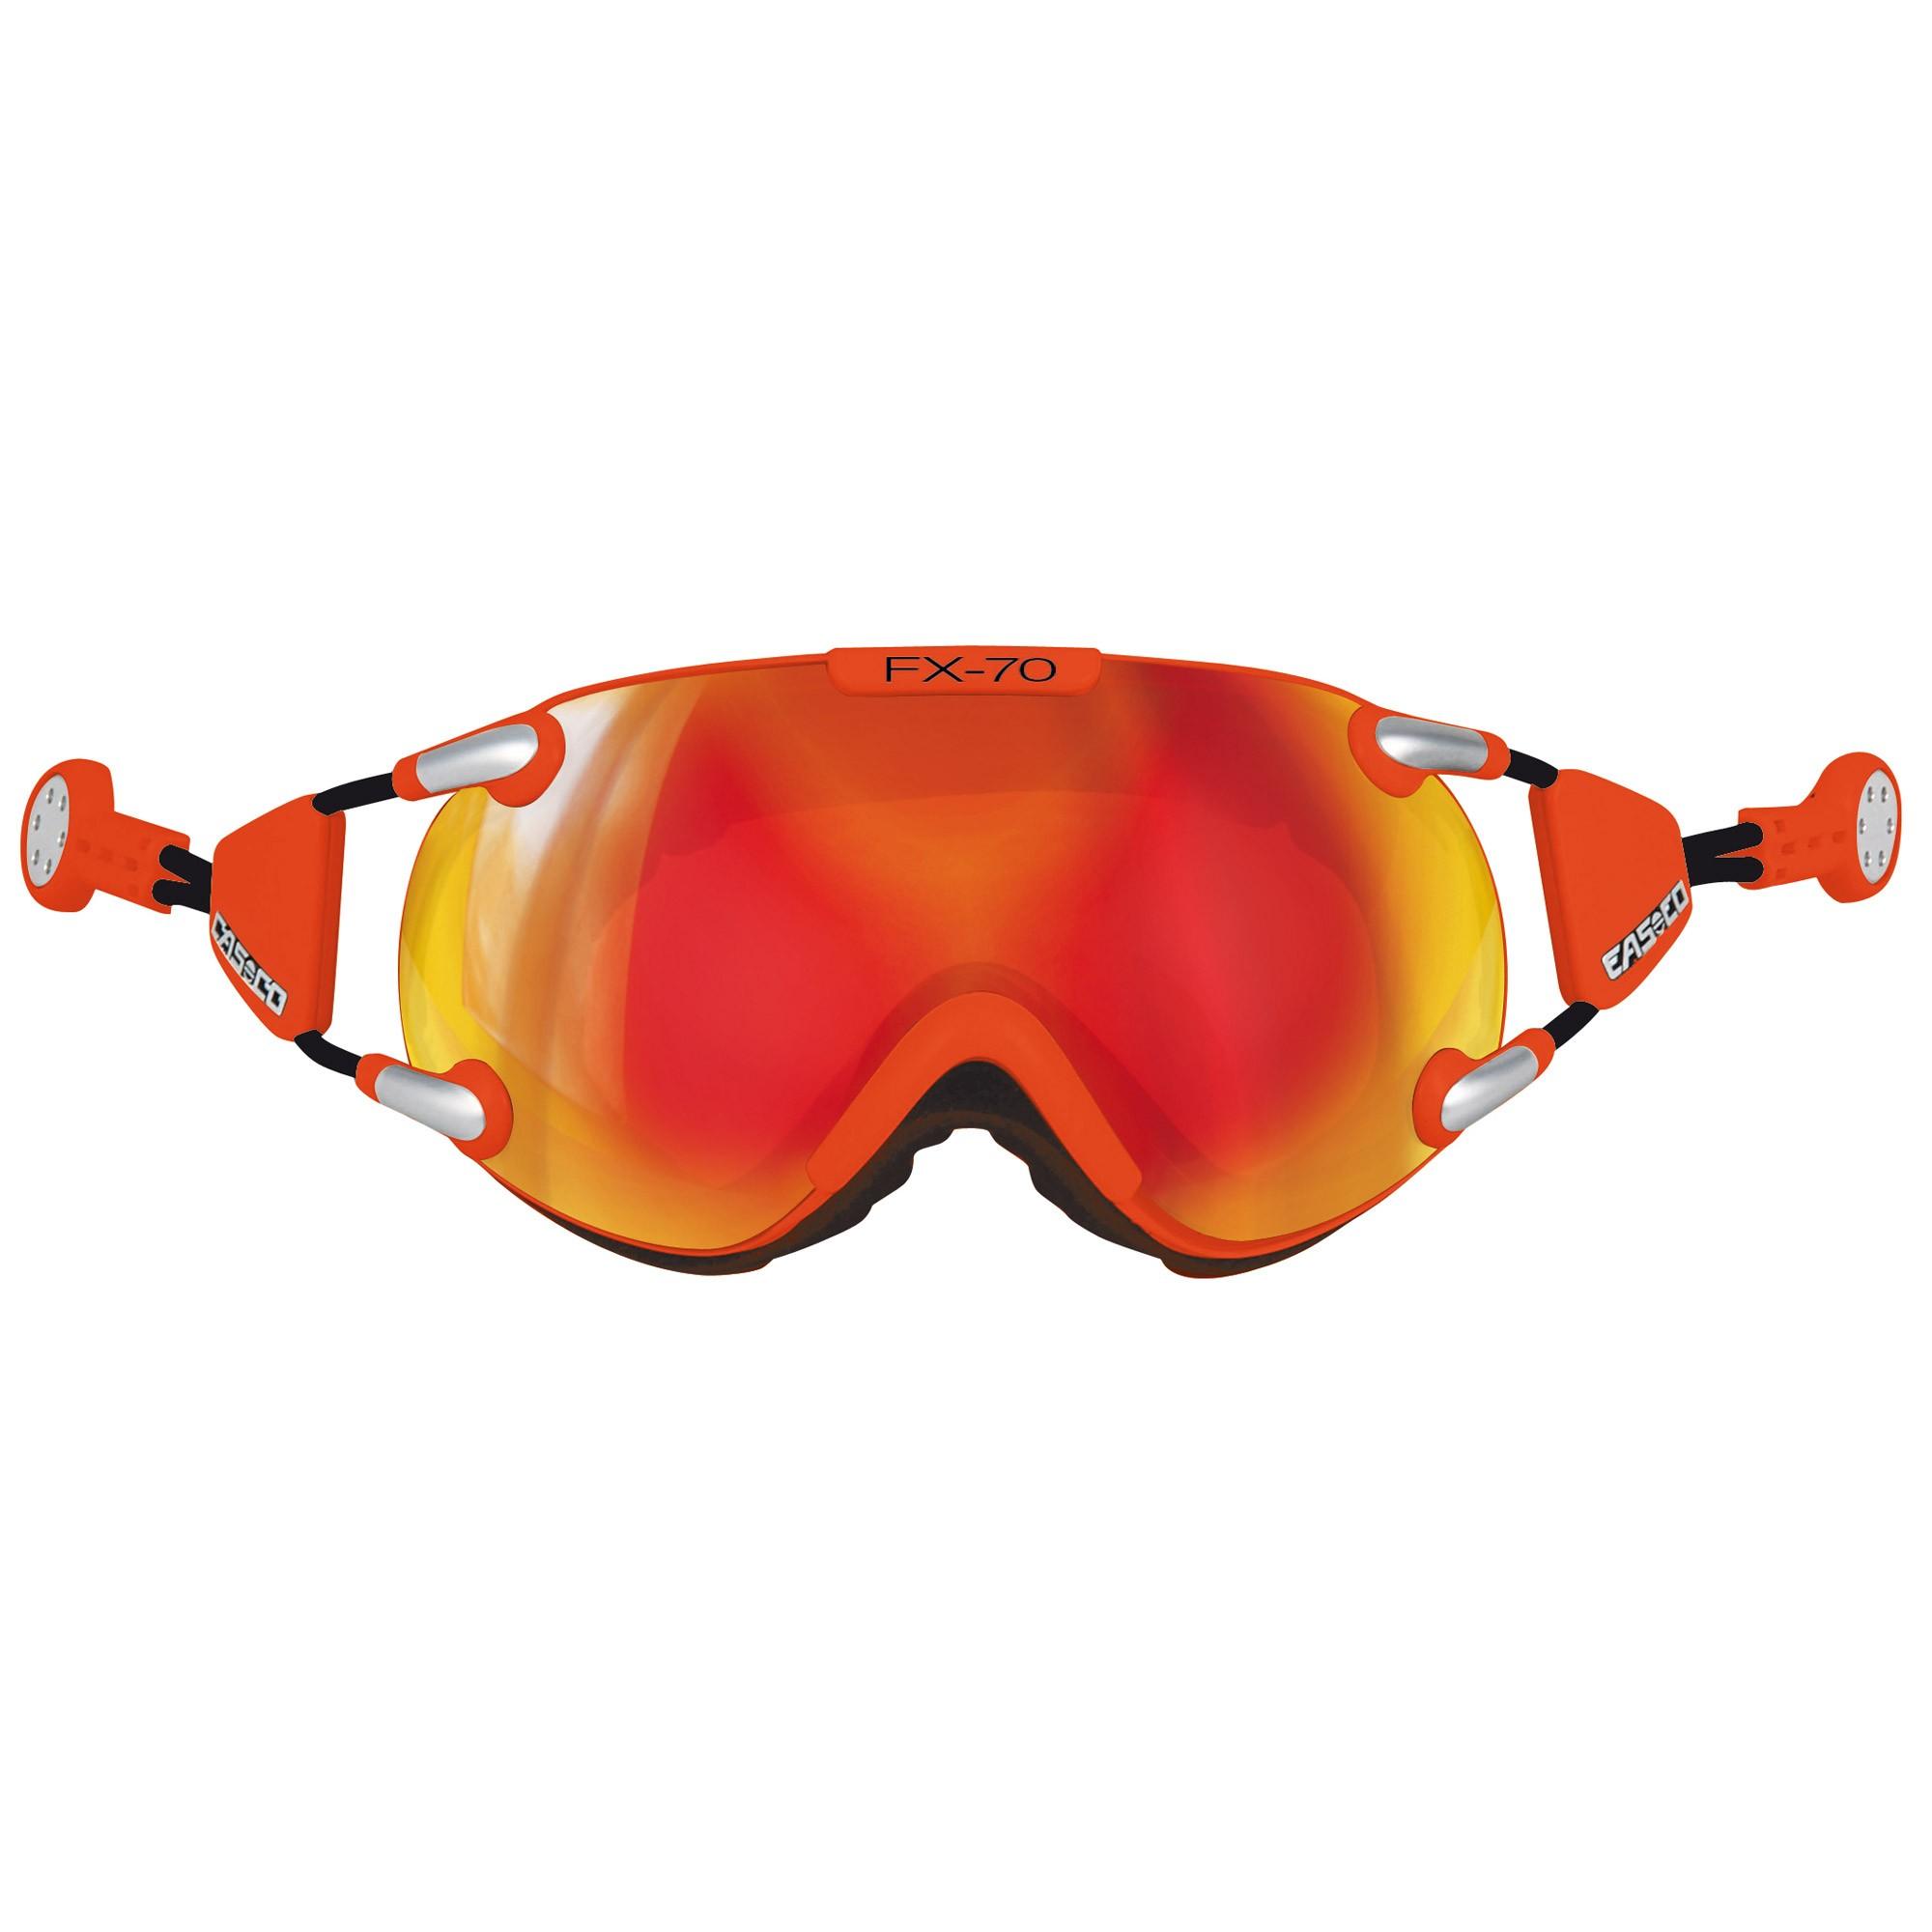 Afbeelding van Casco FX70 Carbonic Skibril M Neon Orange